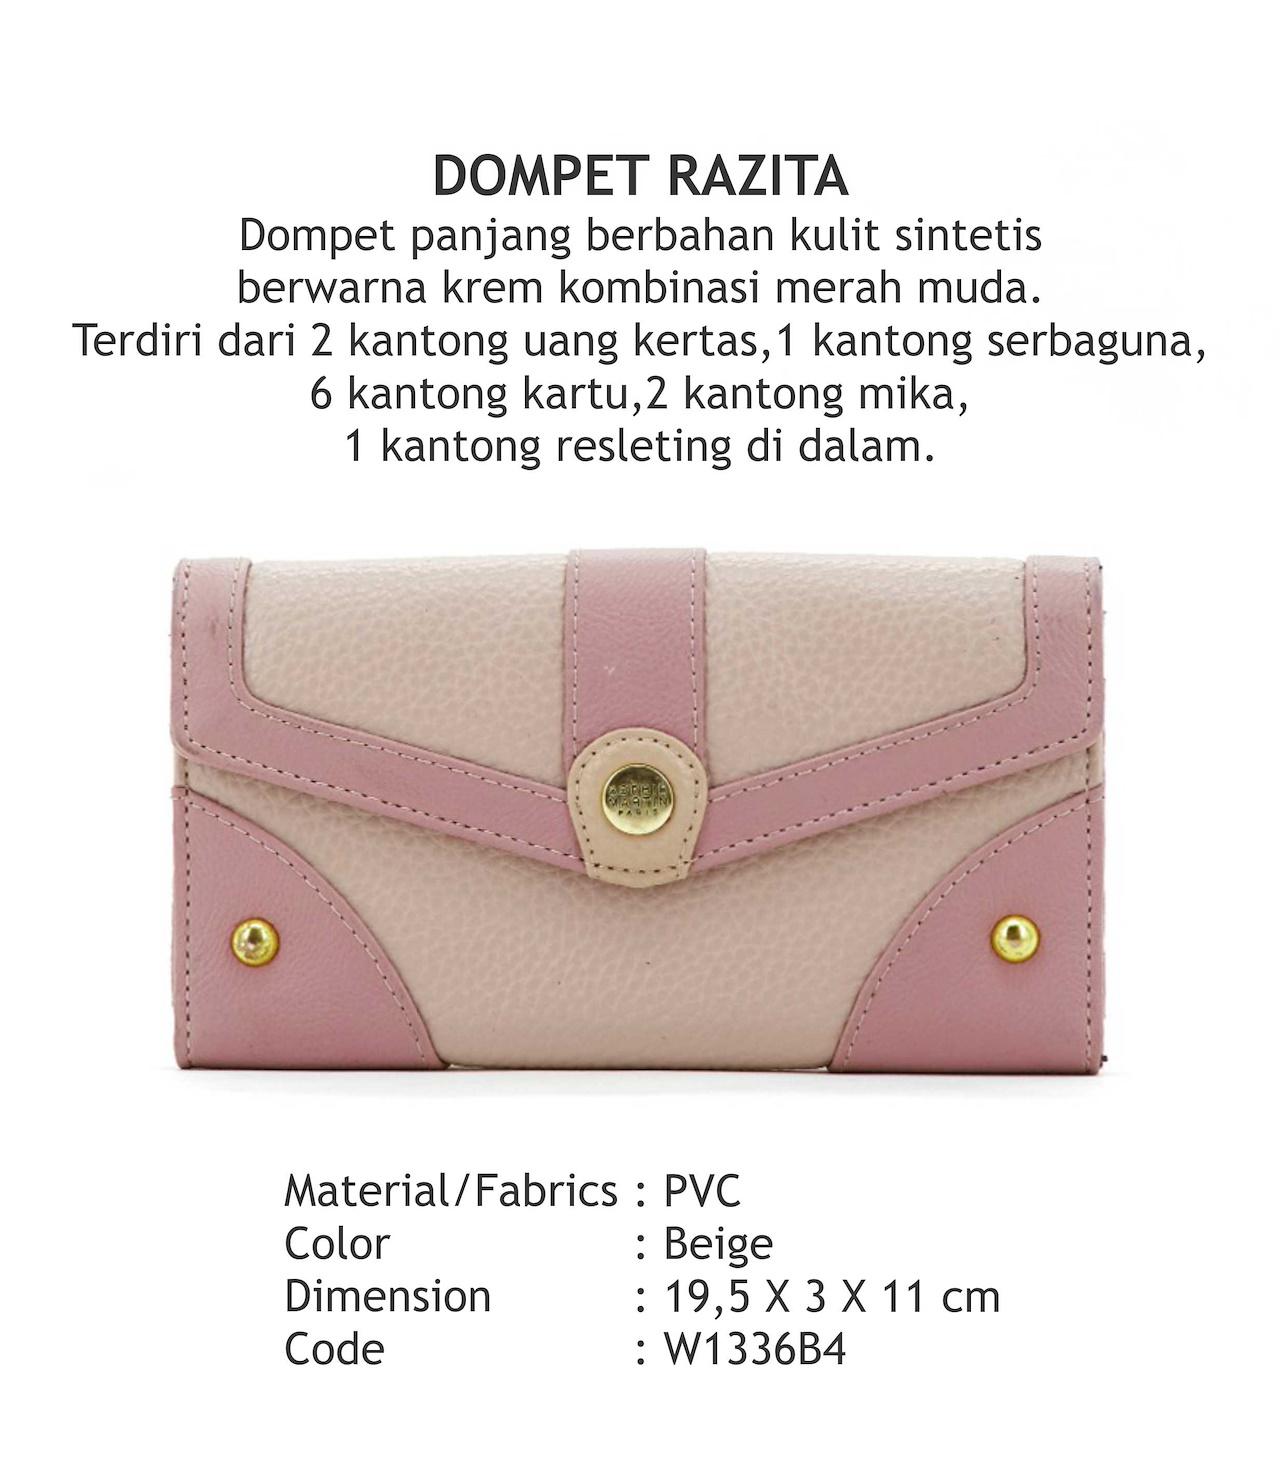 Buy Promo Tahun Baru Dompet Sophie Martin Sale Discount Up To 50 Kantong Mika Highlights